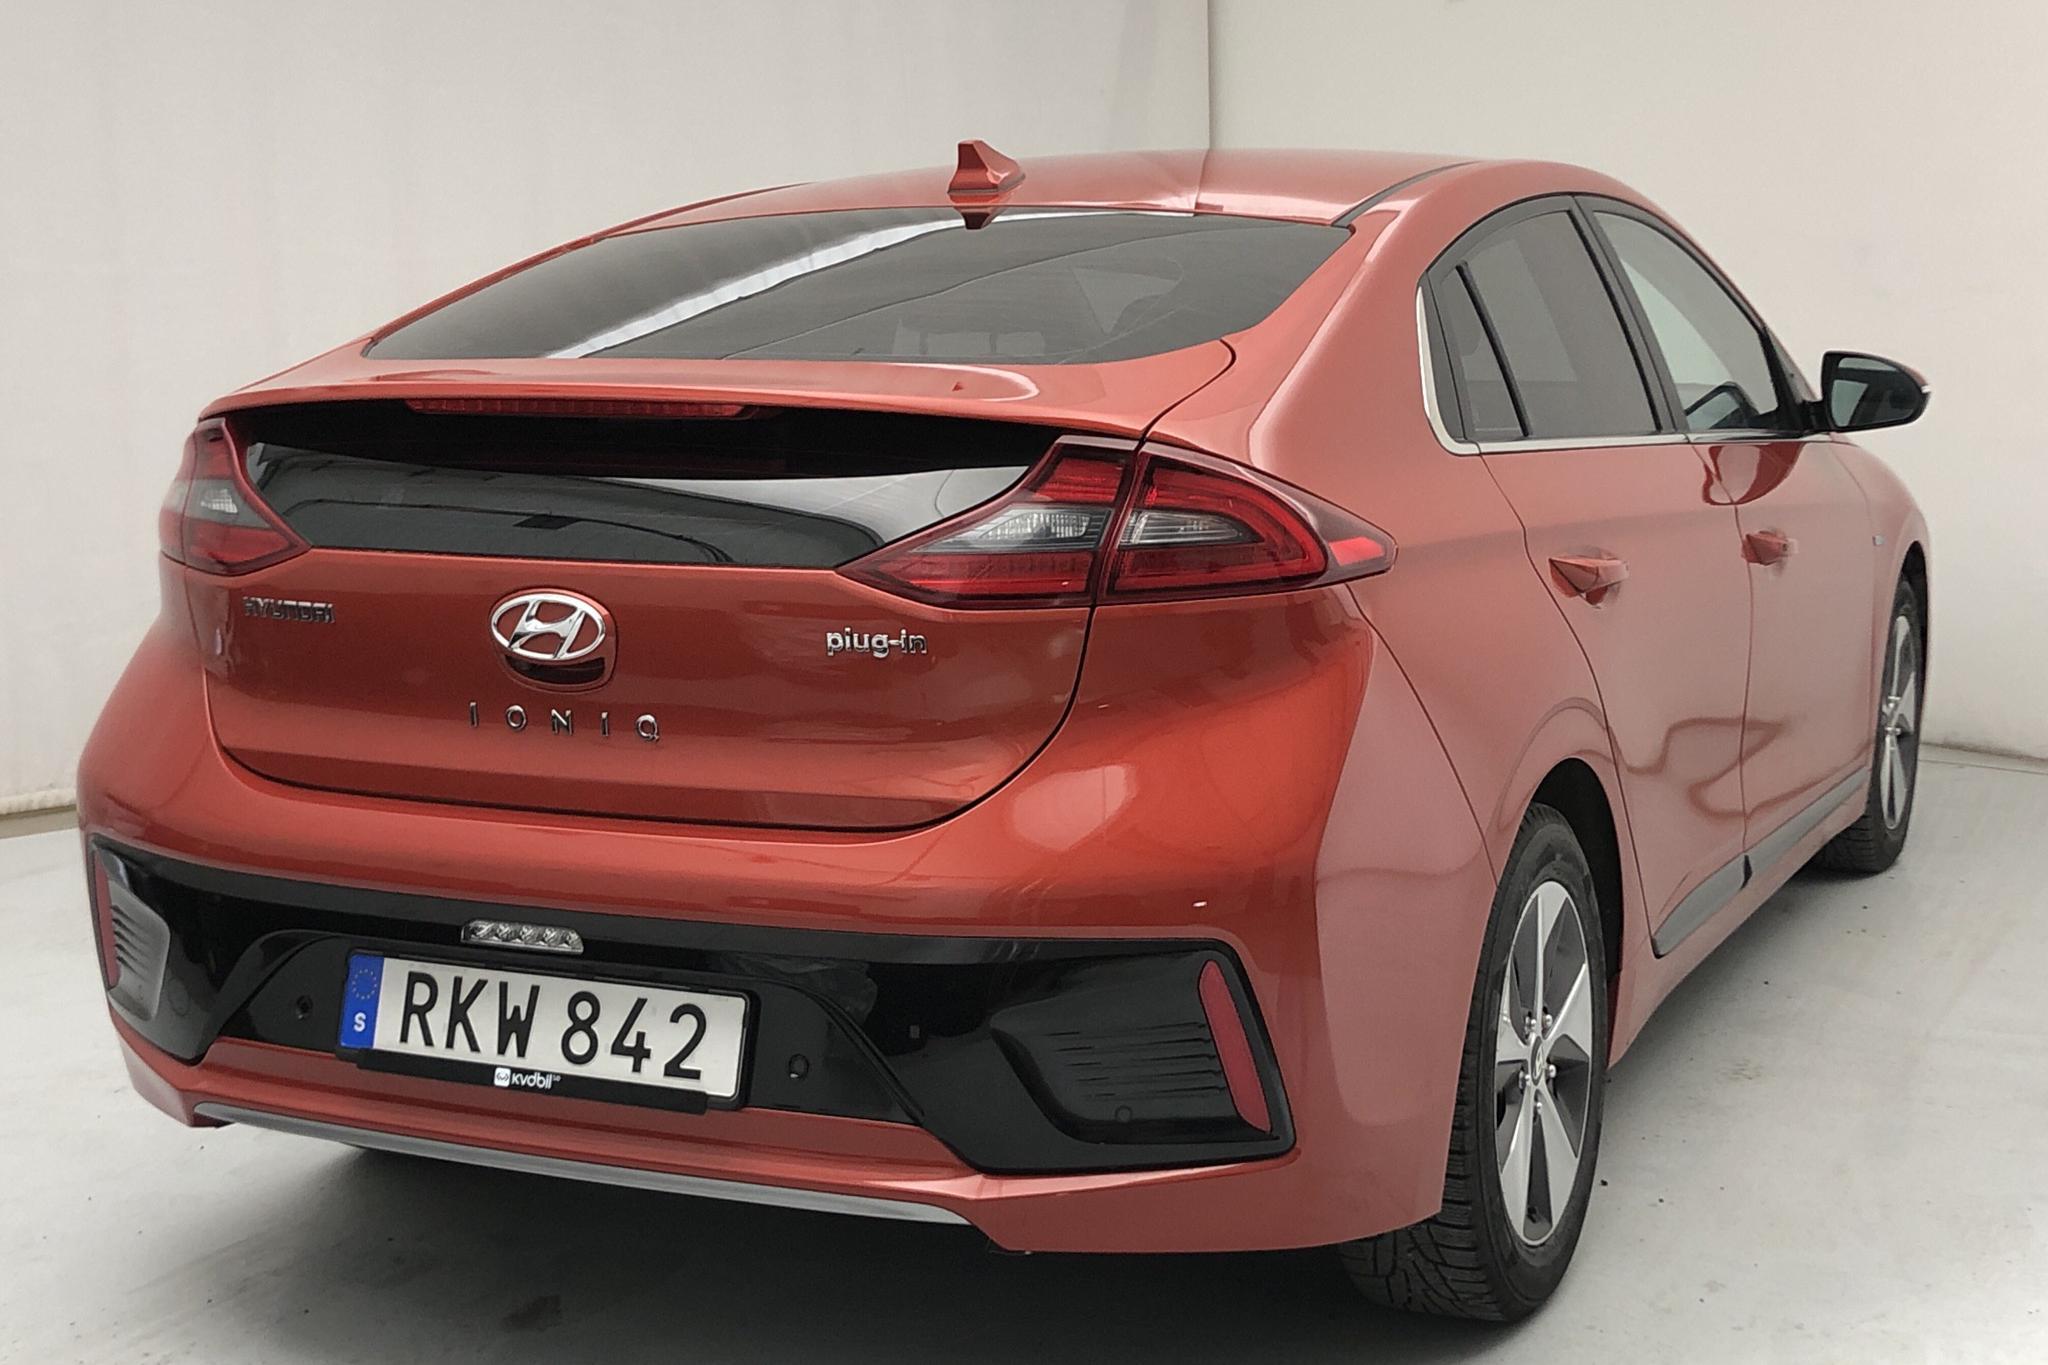 Hyundai IONIQ Plug-in (141hk) - 2 504 mil - Automat - orange - 2017